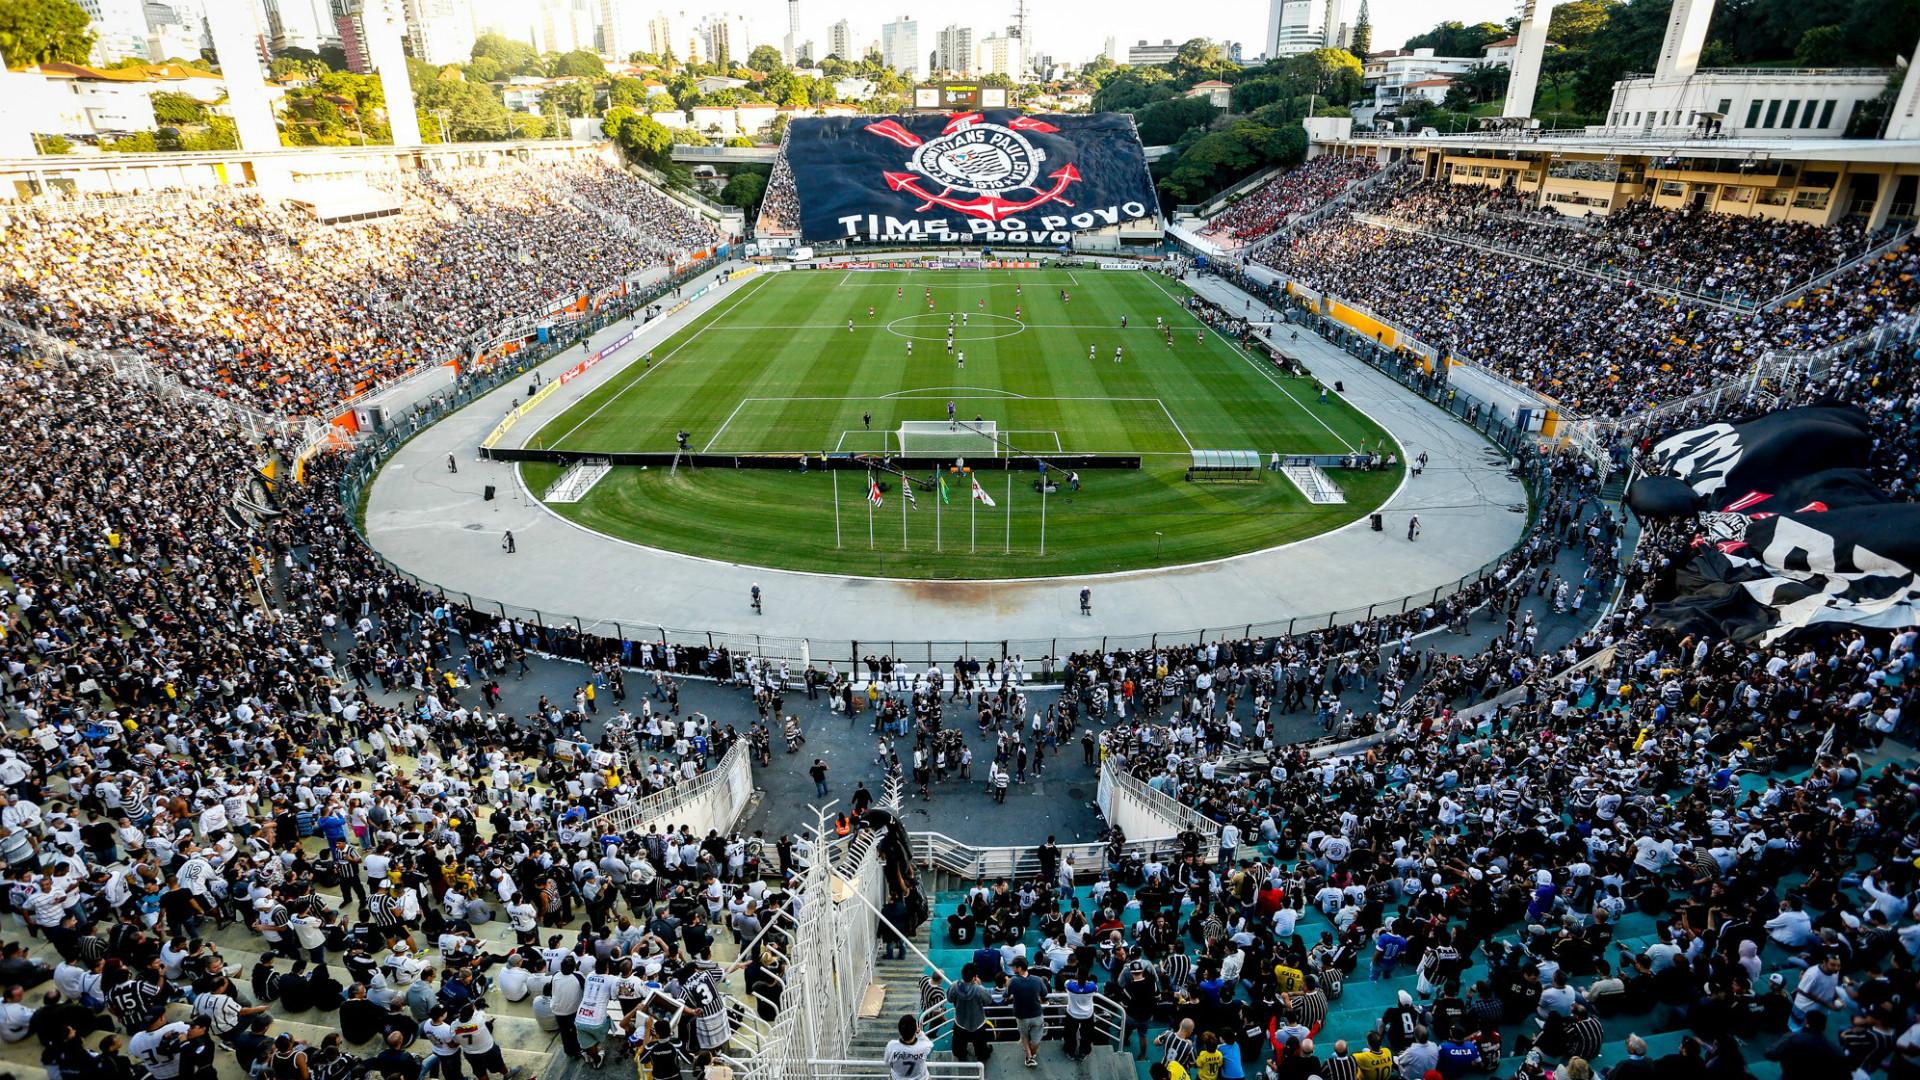 Corinthians - Pacaembu - 28/04/2014